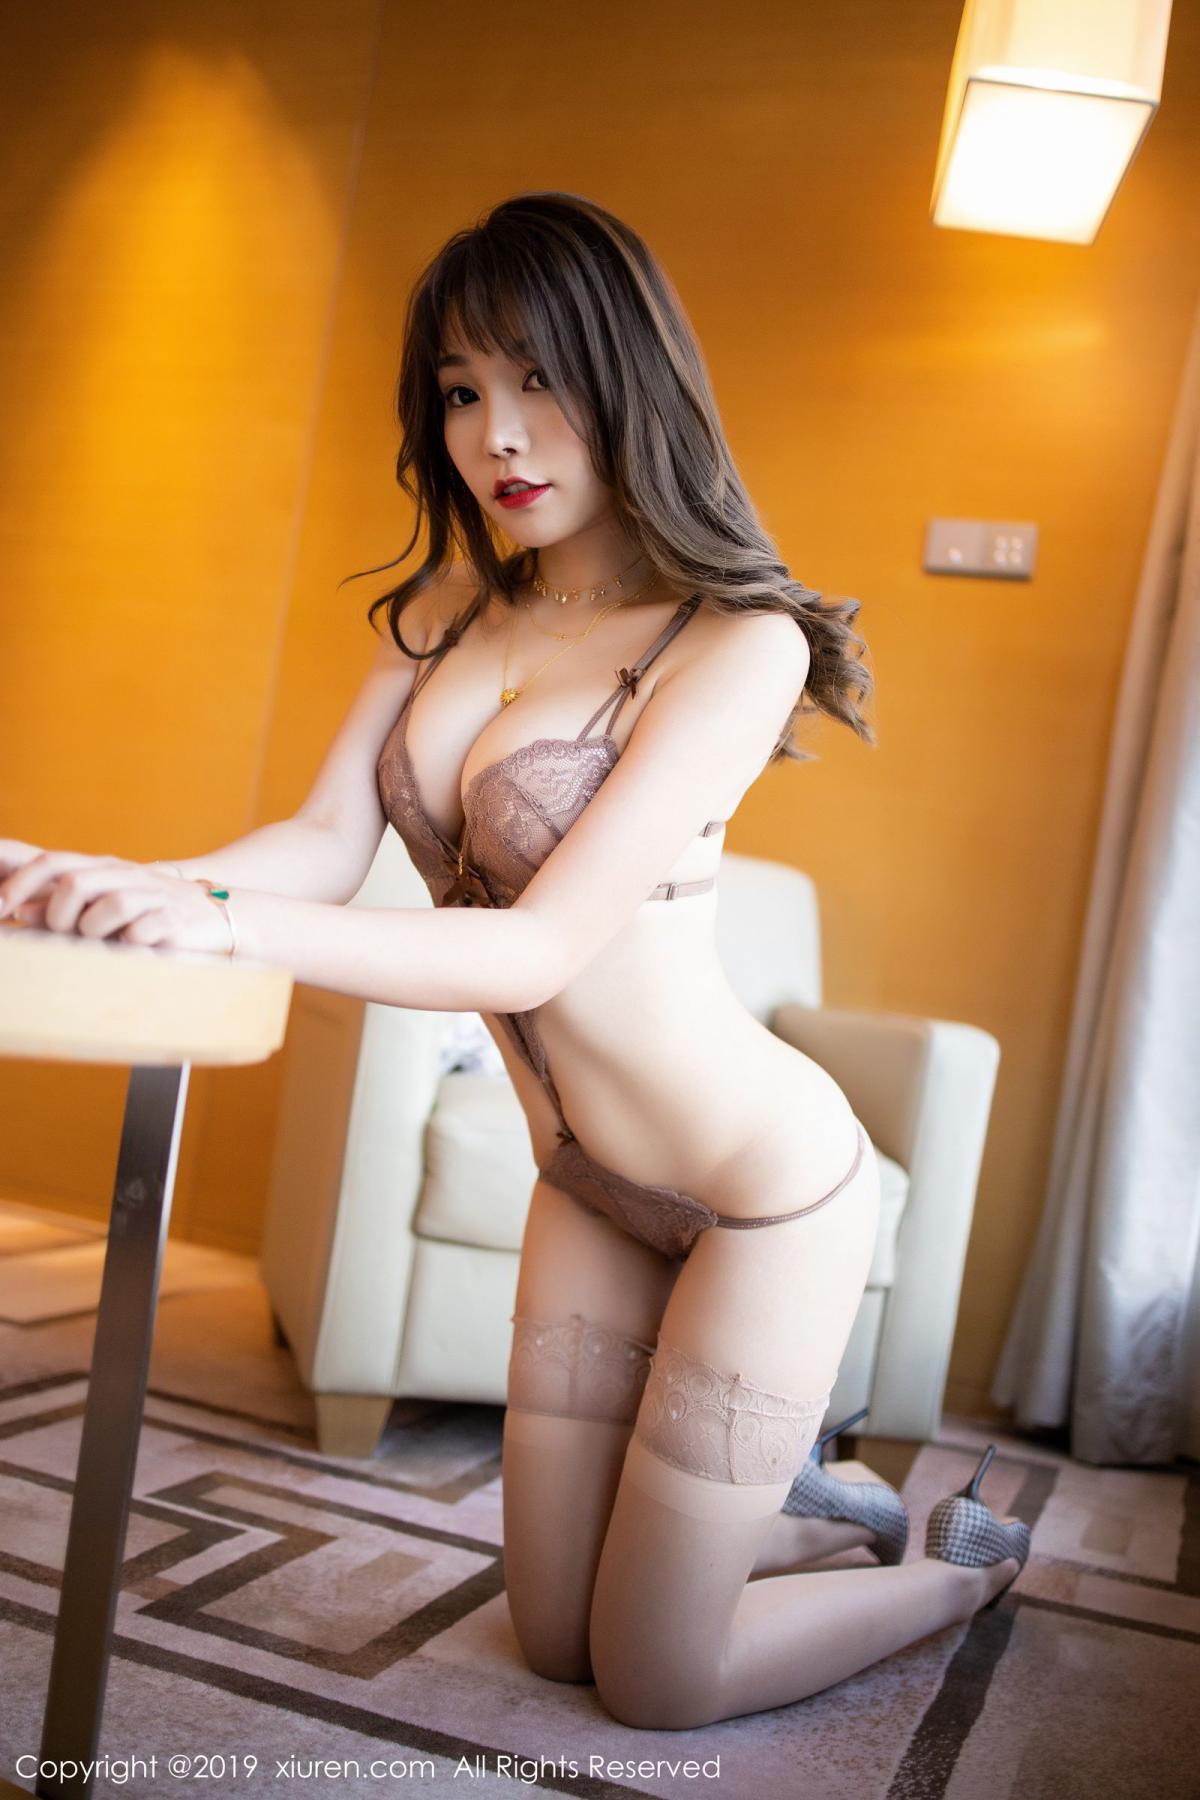 [XiuRen] Vol.1675 Chen Zhi 46P, Chen Zhi, Cheongsam, Tall, Underwear, Xiuren